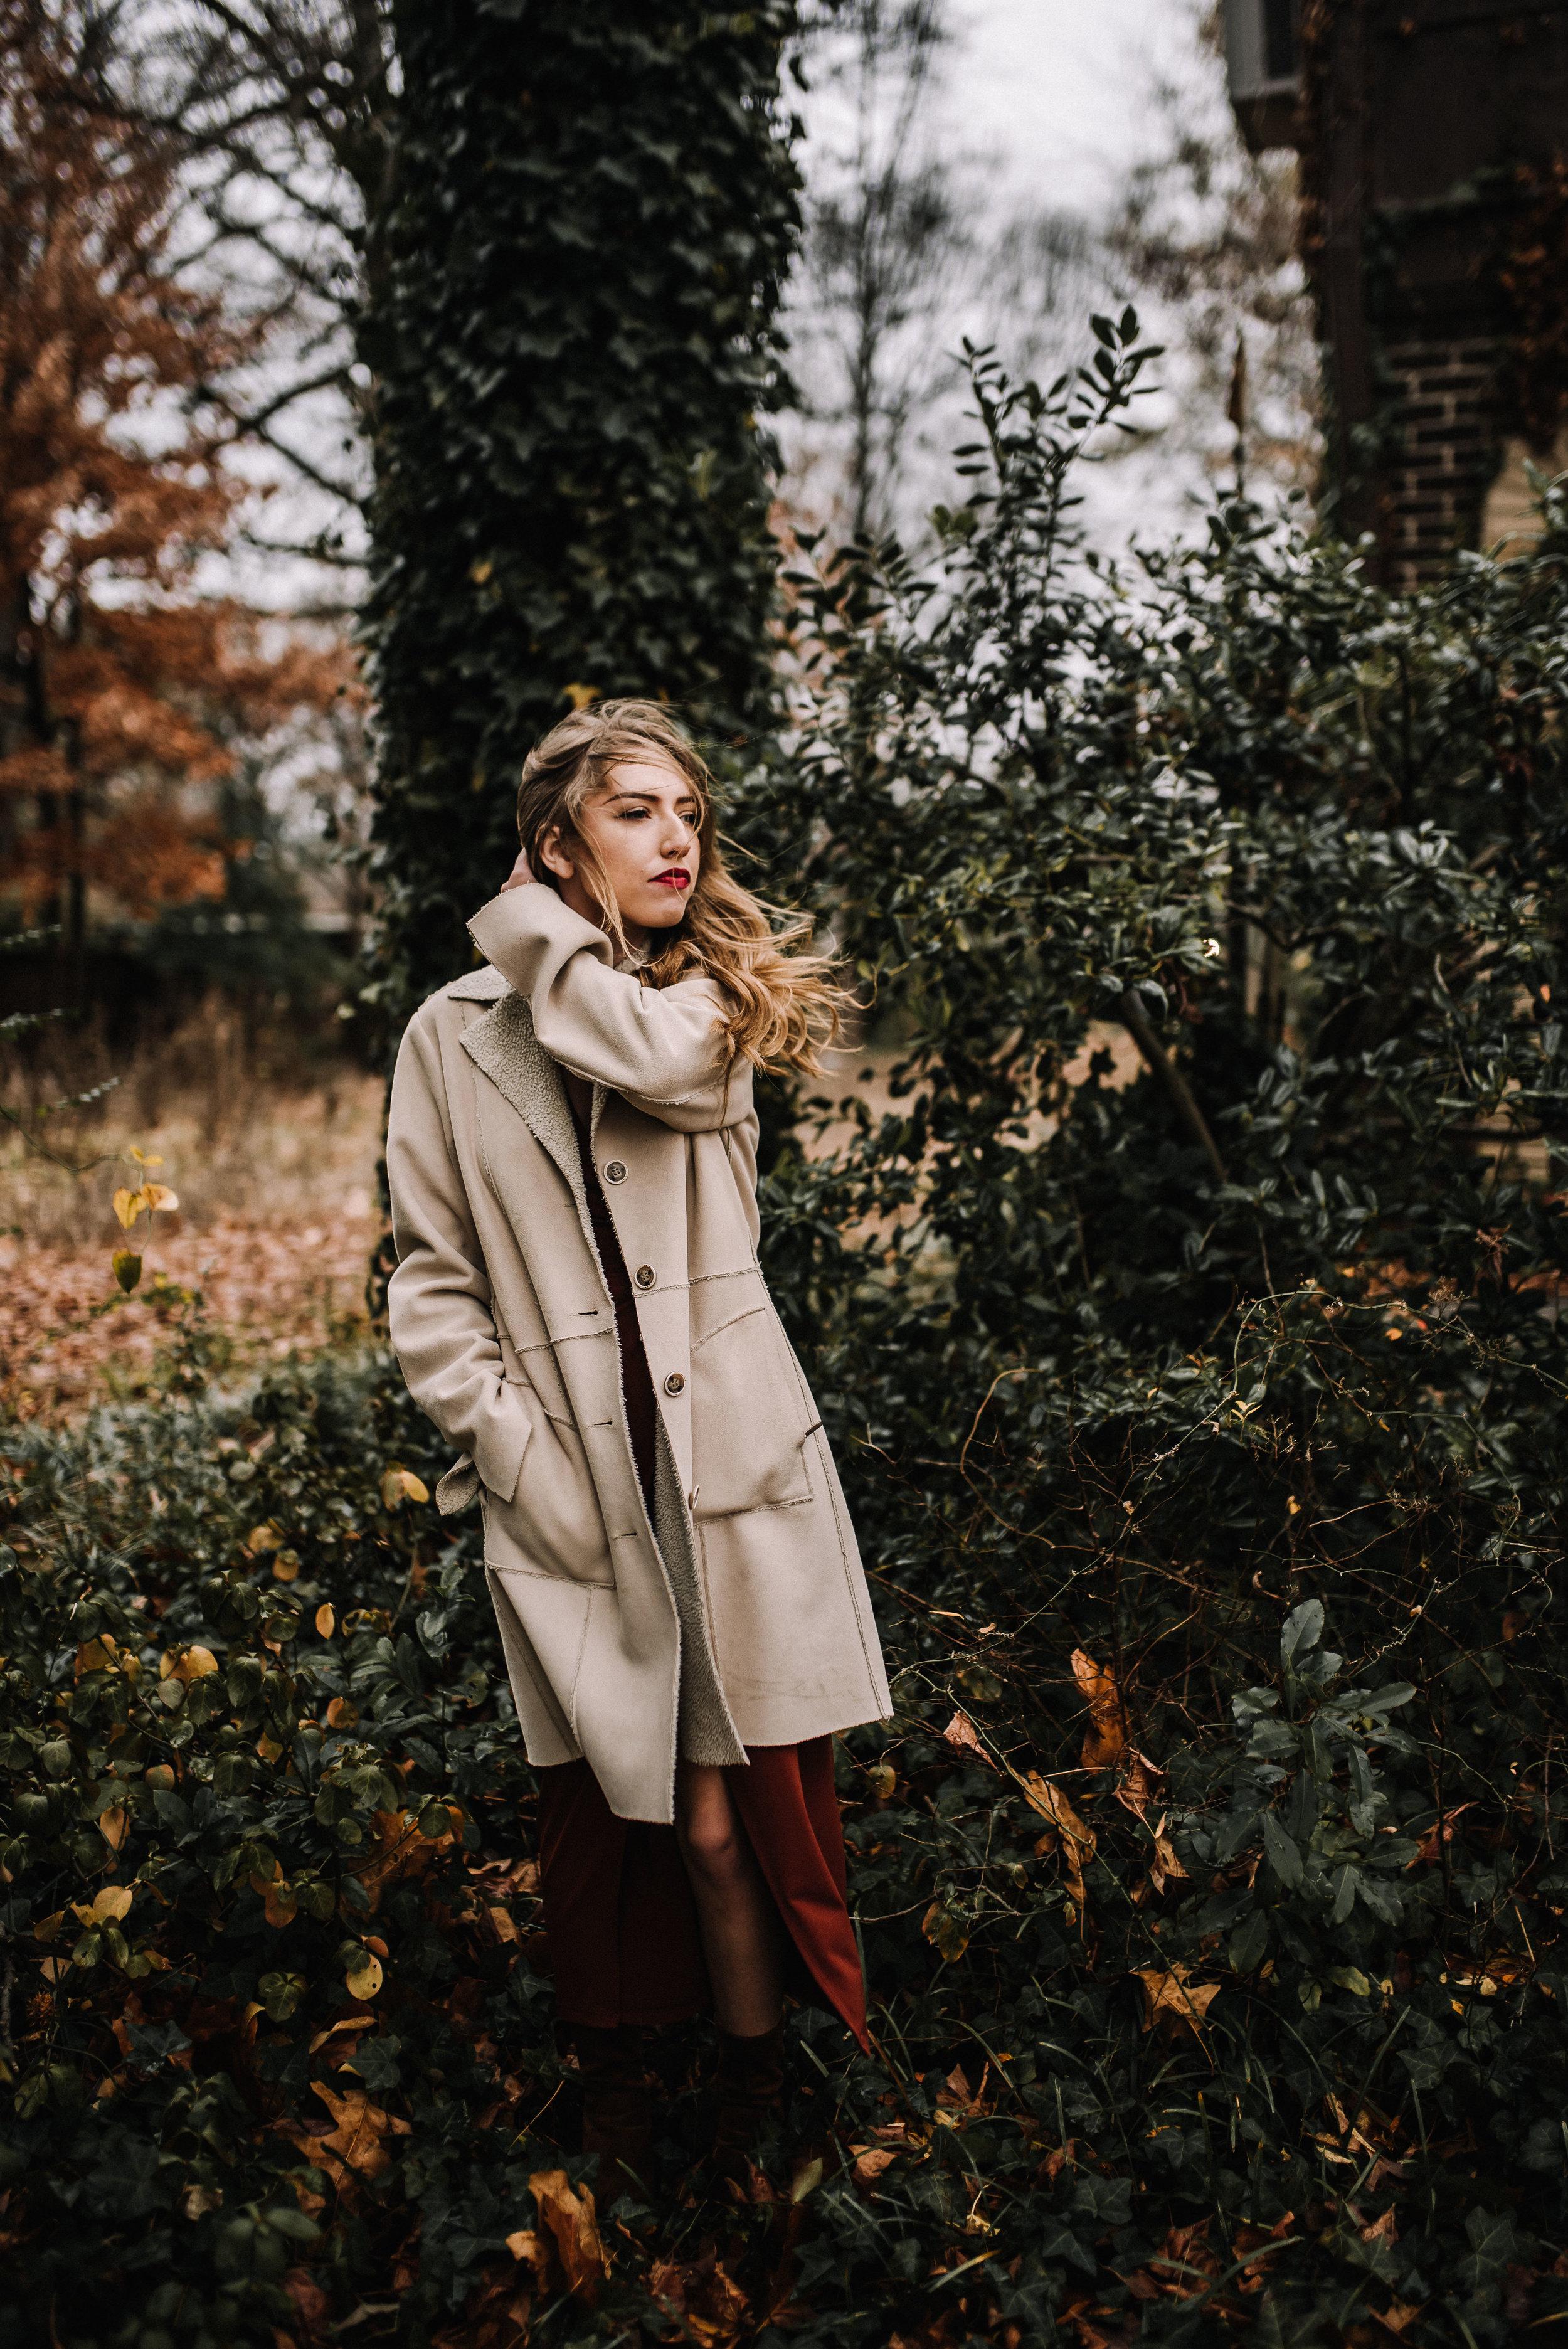 Kaitlyn_Ashley-Benham-Photography-39.jpg